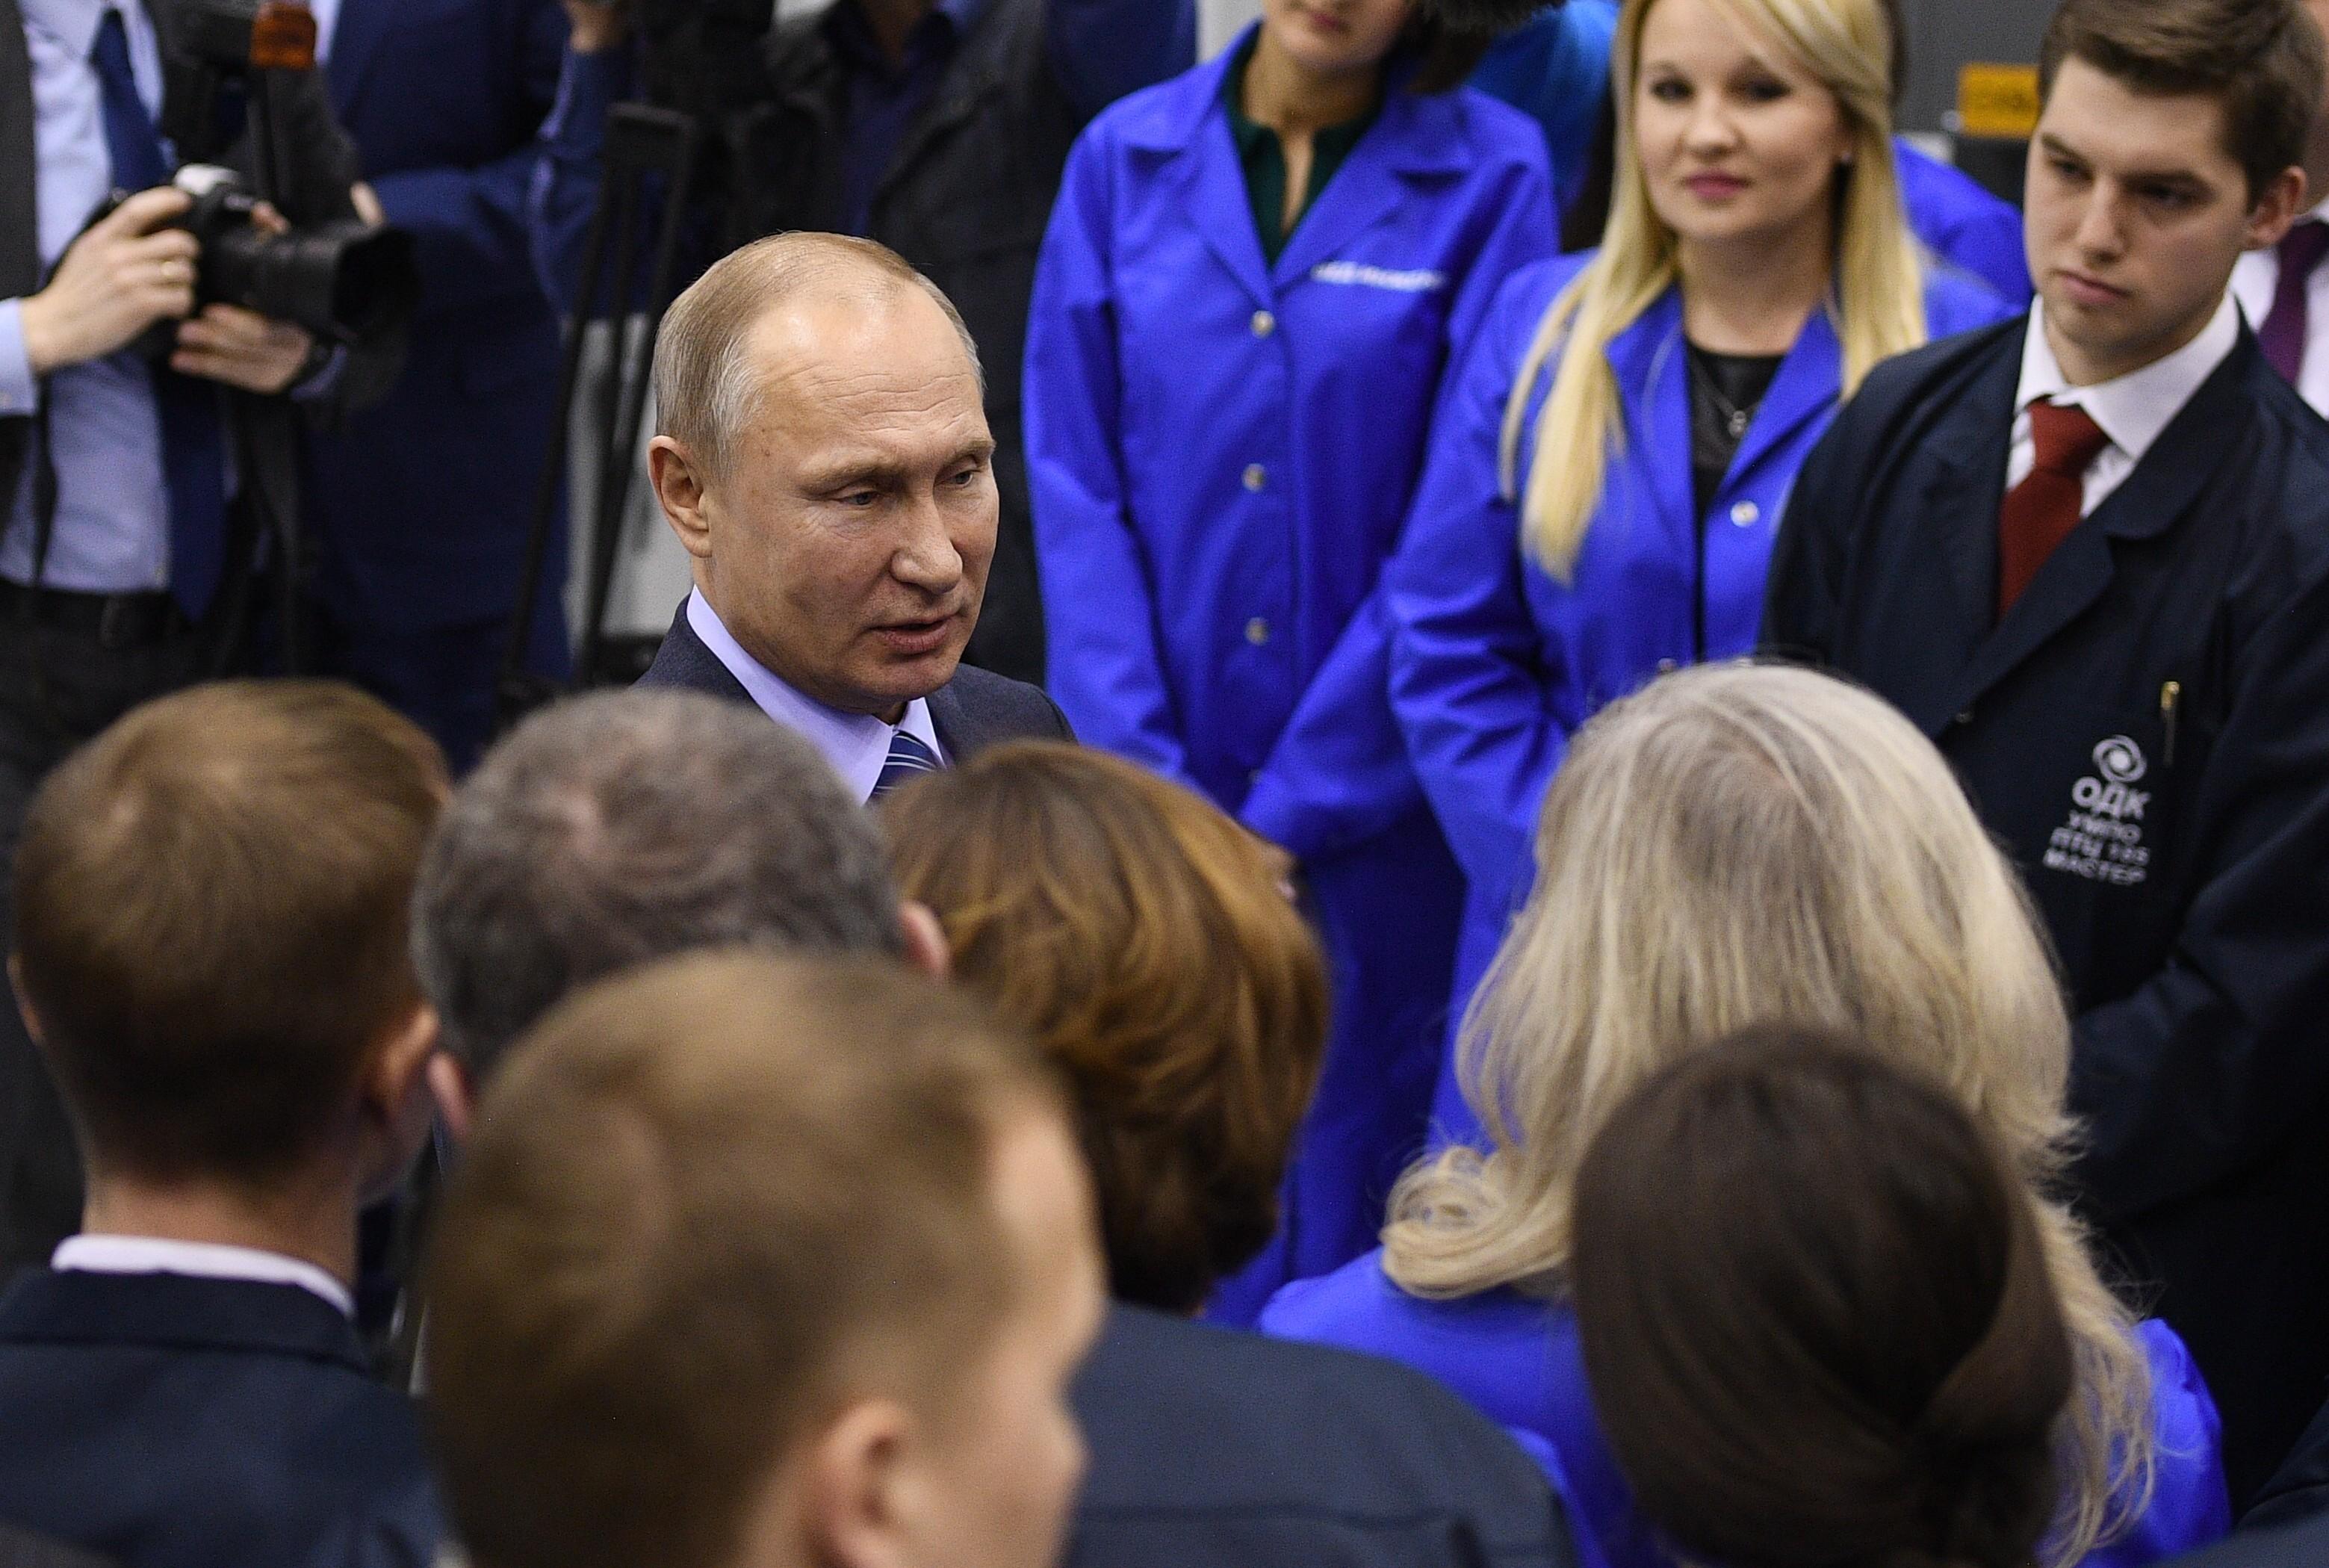 Фото: © РИА Новости/Рамиль Ситдиков